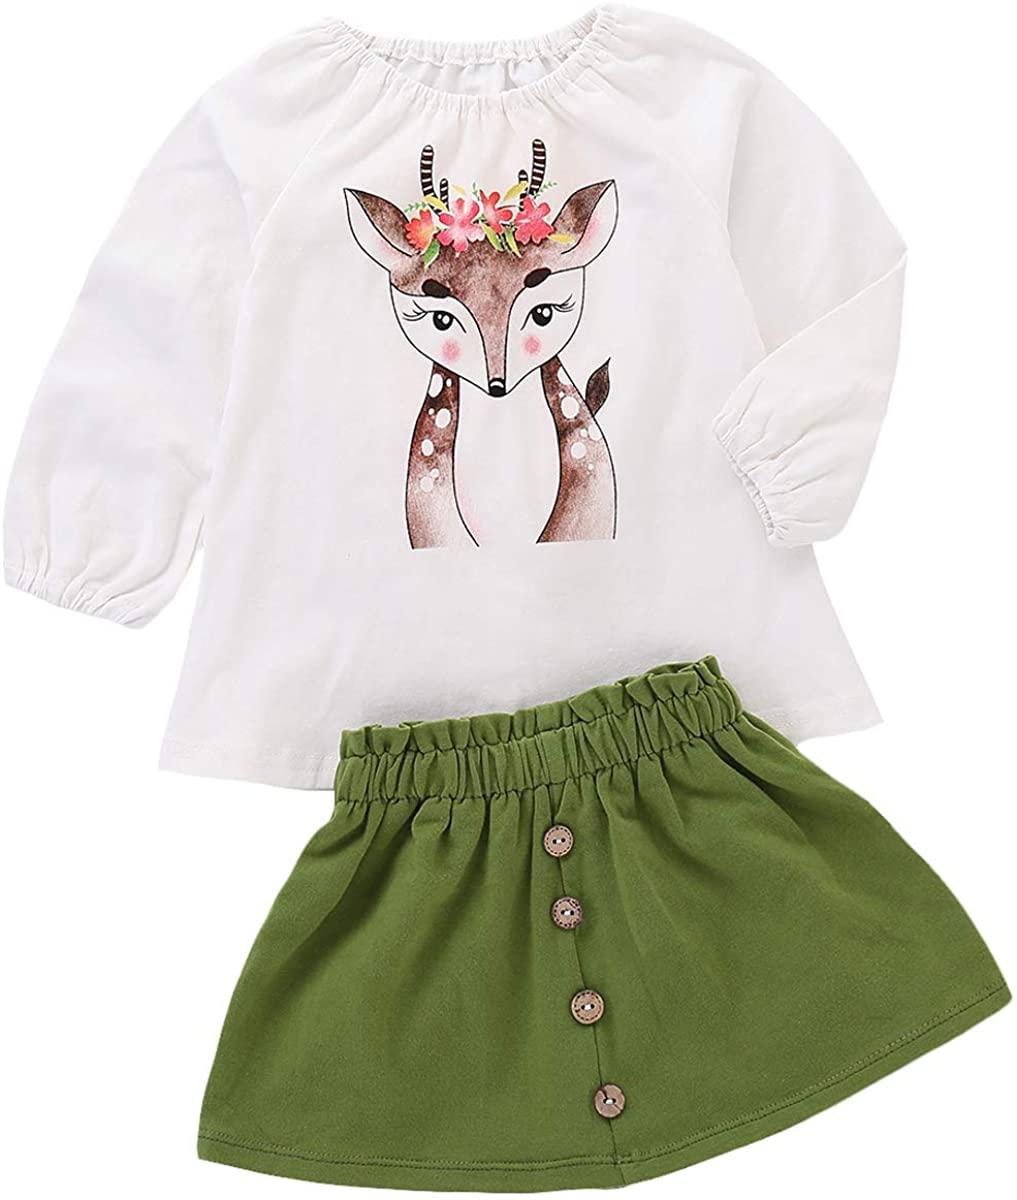 LYSMuch Toddler Kids Baby Girls Dress Printed Long Sleeve Green Princess Skirt Suit